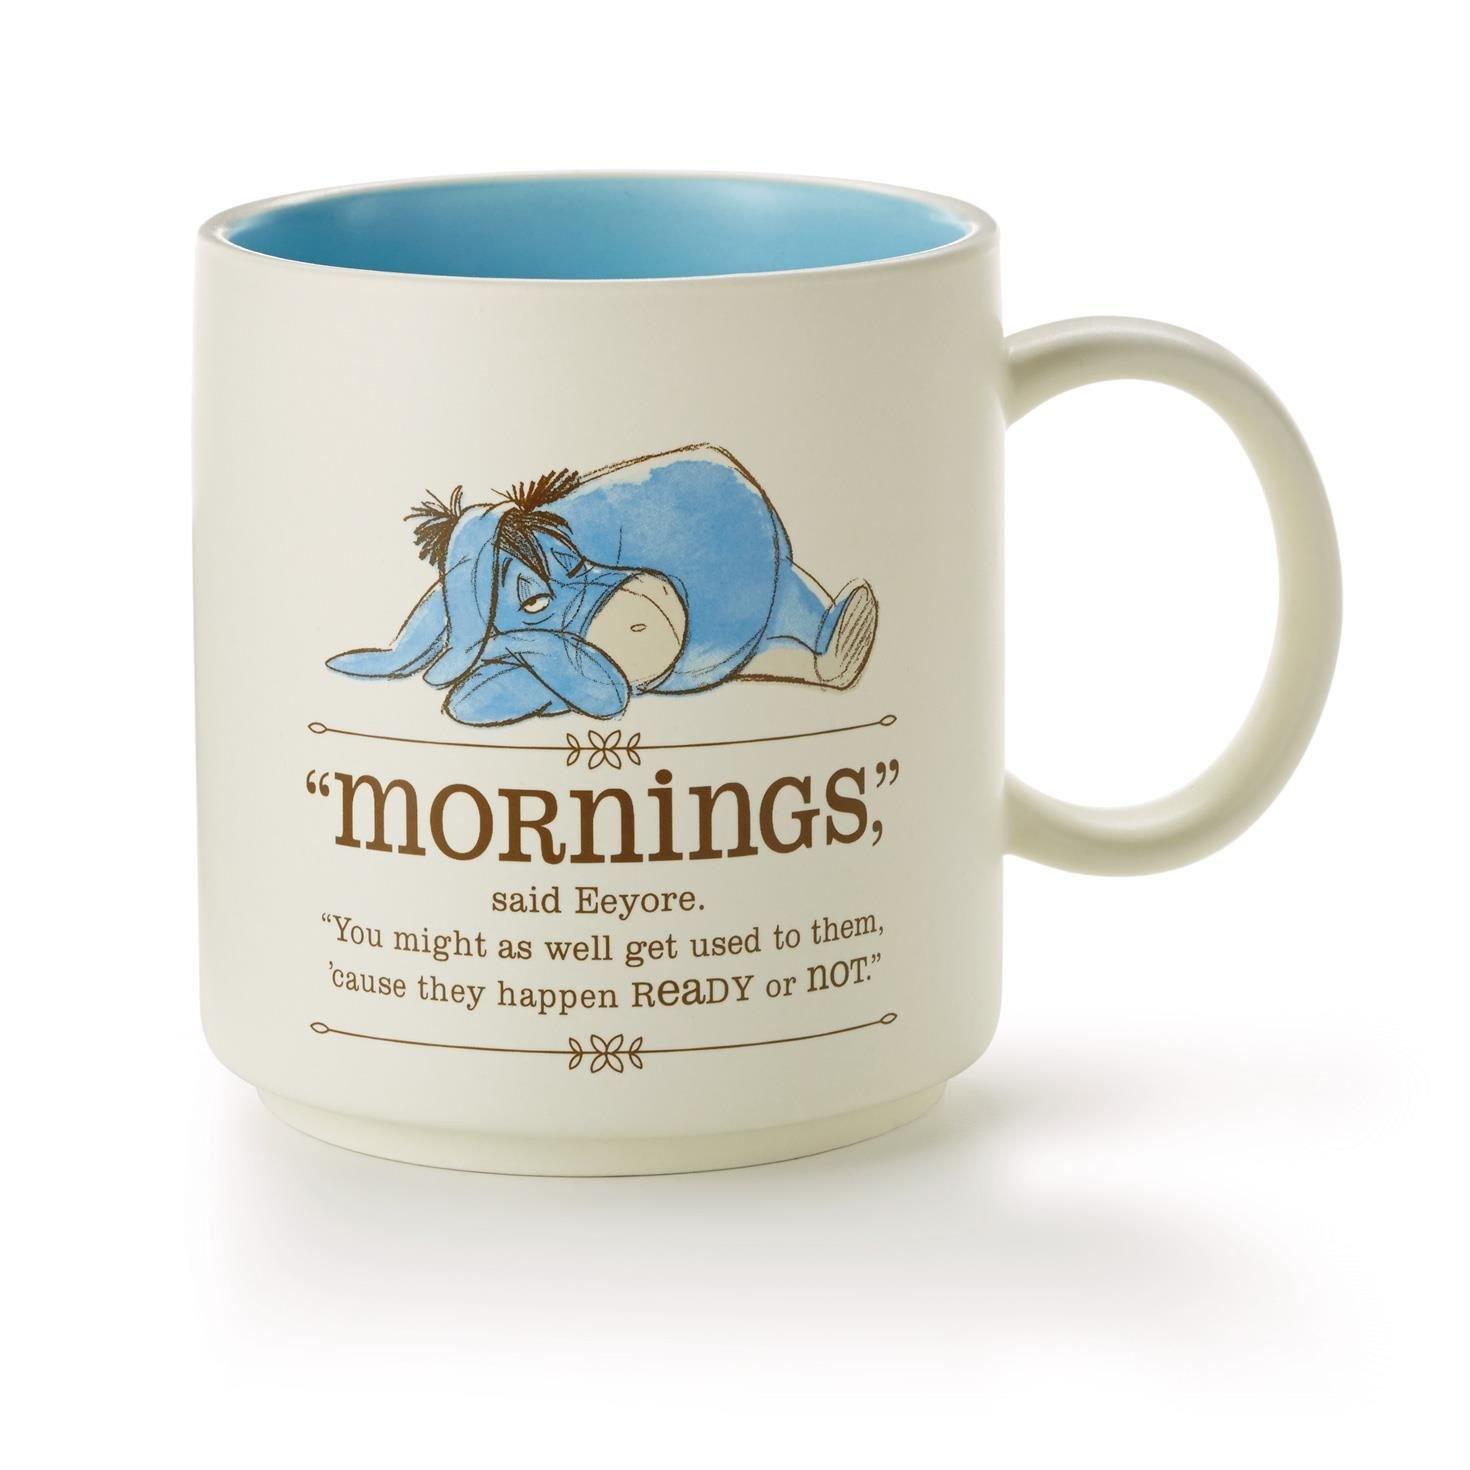 9899f238556 Cheap Winnie The Pooh Coffee Mug, find Winnie The Pooh Coffee Mug ...